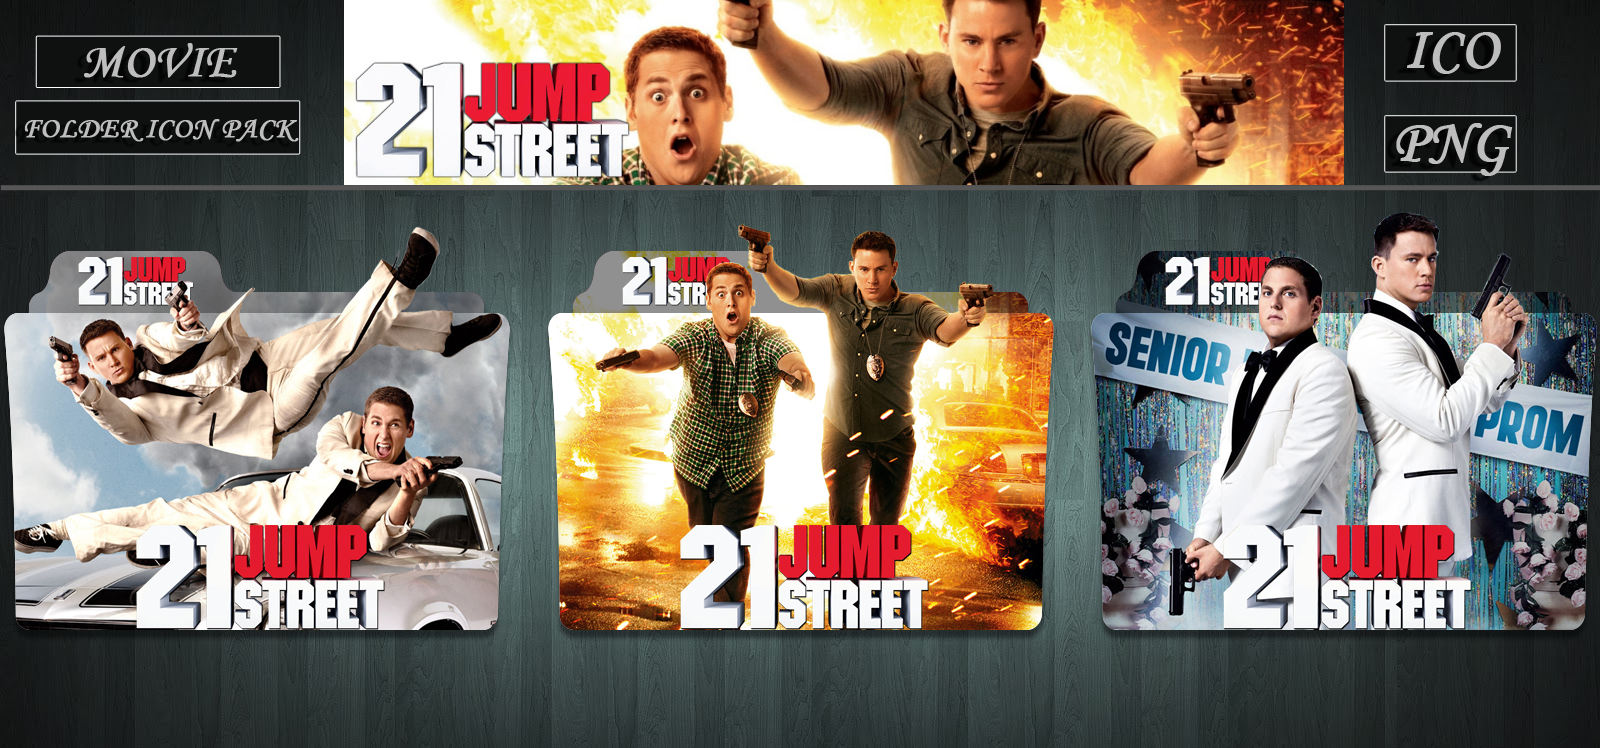 21 Jump Street 2012 Folder Icon Pack By Zsotti60 On Deviantart